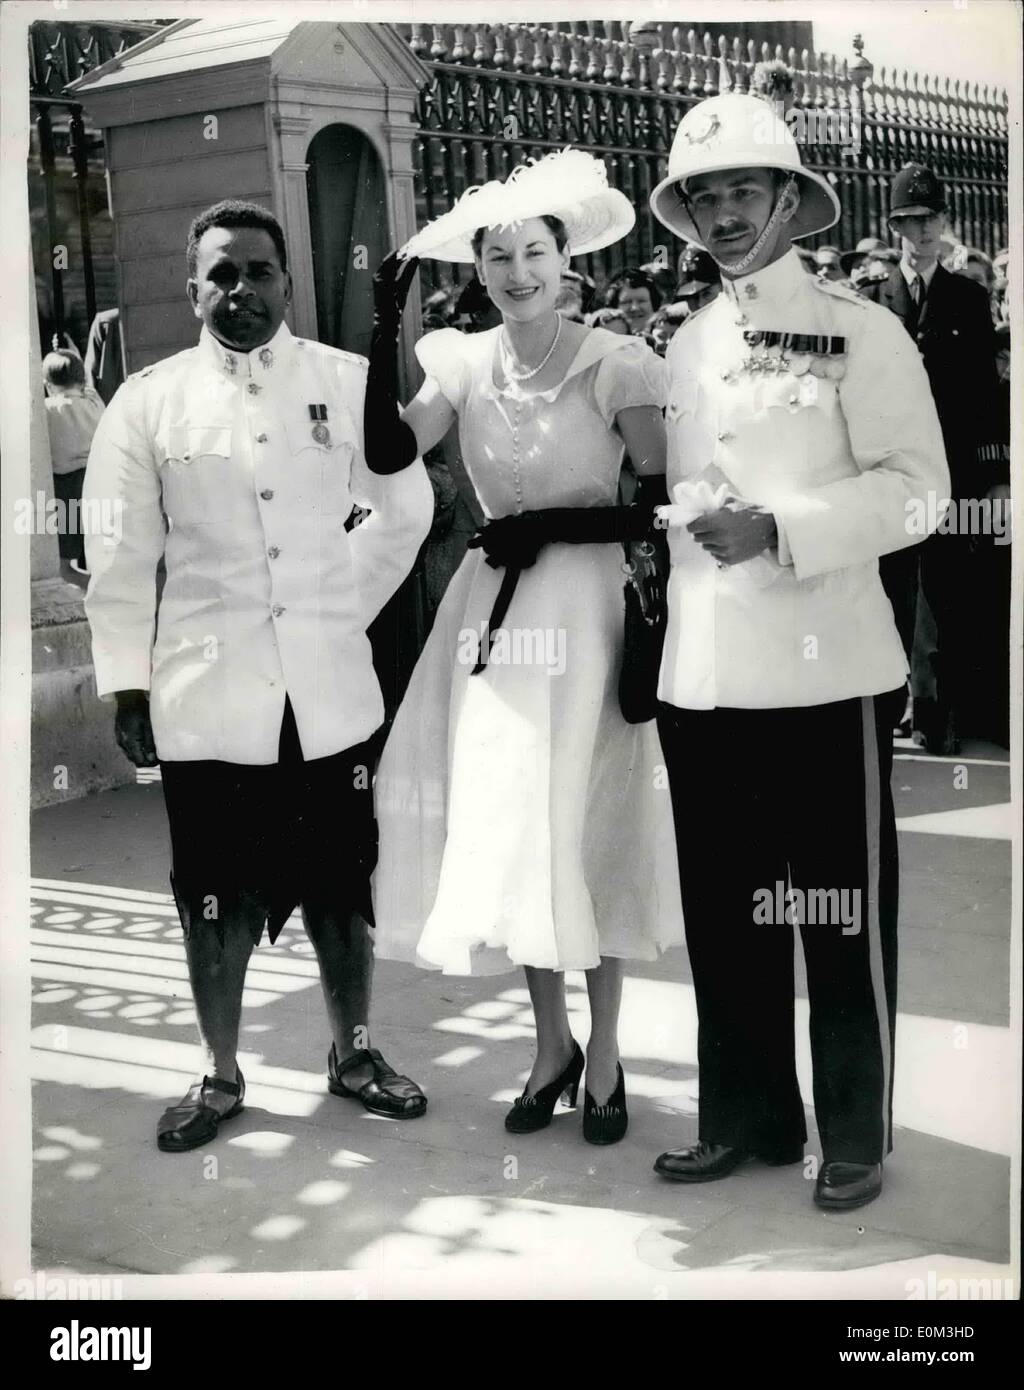 5. Mai 1953 - ROYAL GARDEN PARTY im BUCKINGHAM PALACE - Foto zeigt ...